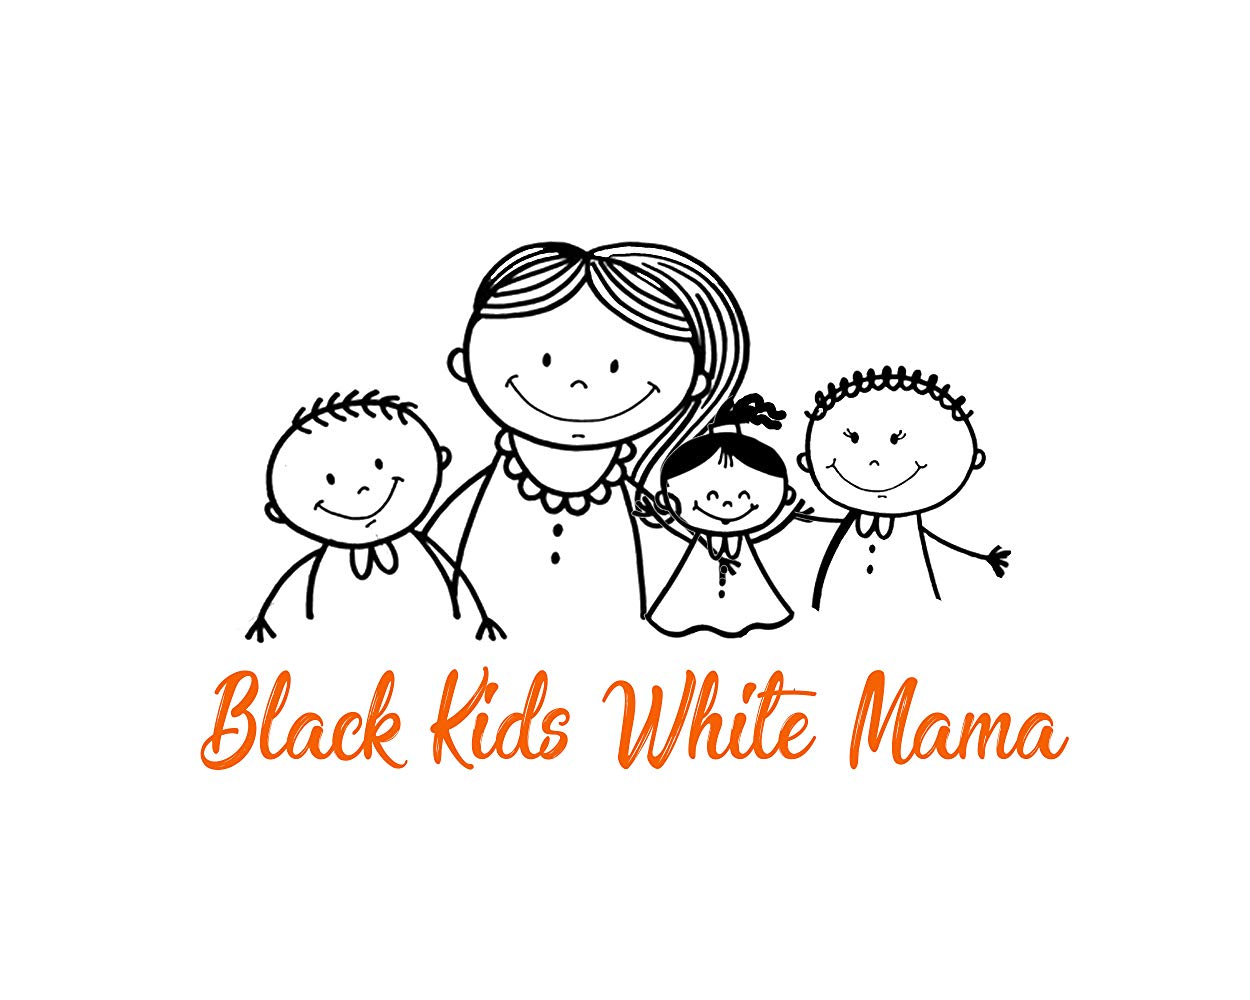 Black Kids White Mama